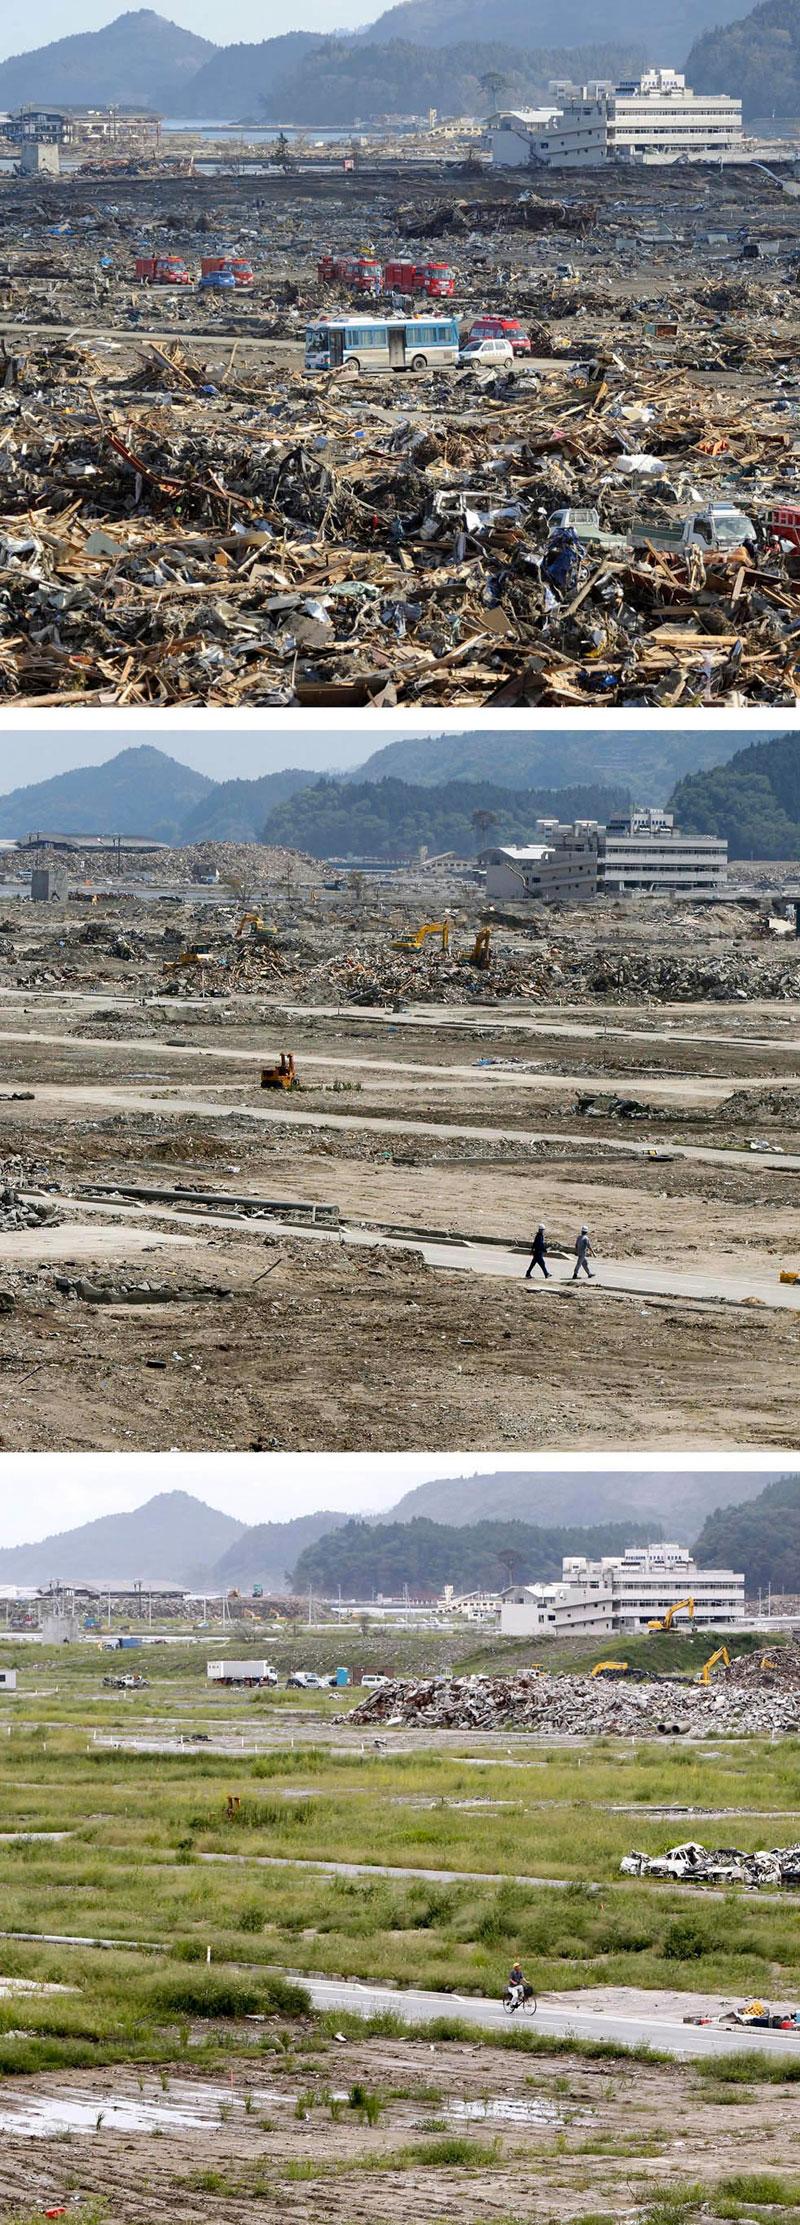 http://www.coucoucircus.org/divers/japon/japon-seisme-11.jpg